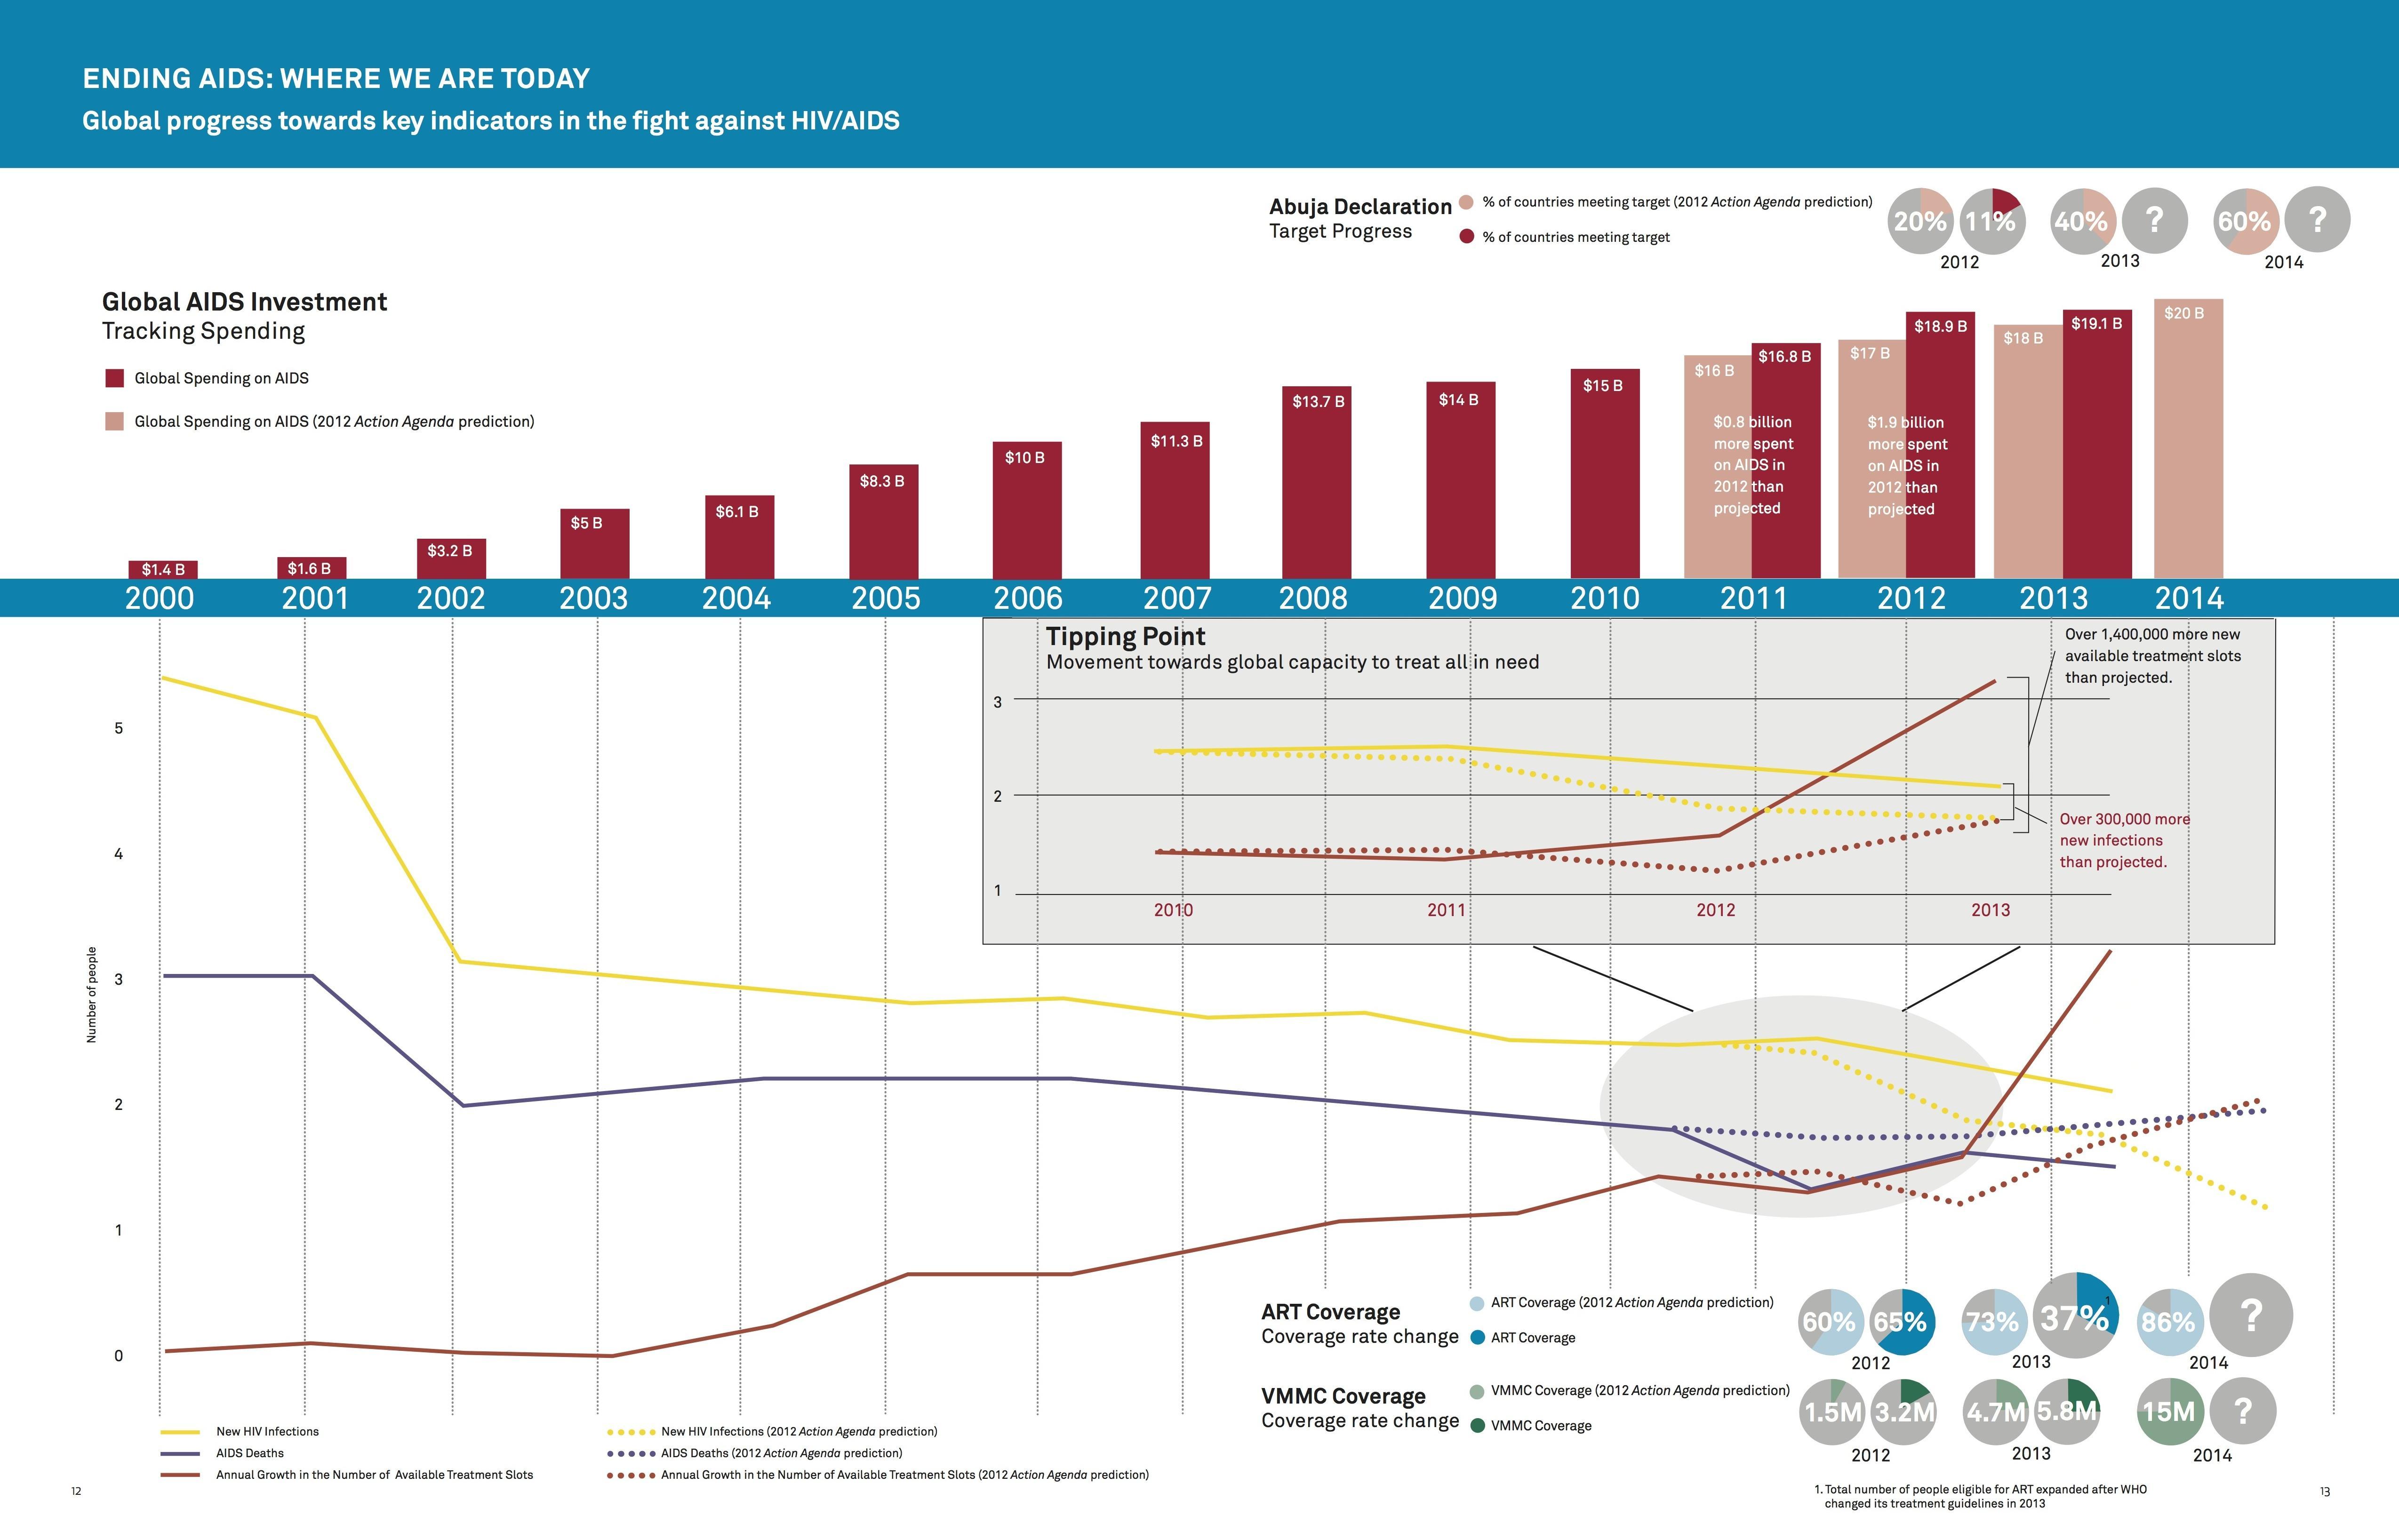 Global progress toward key indicators in the fight against HIV